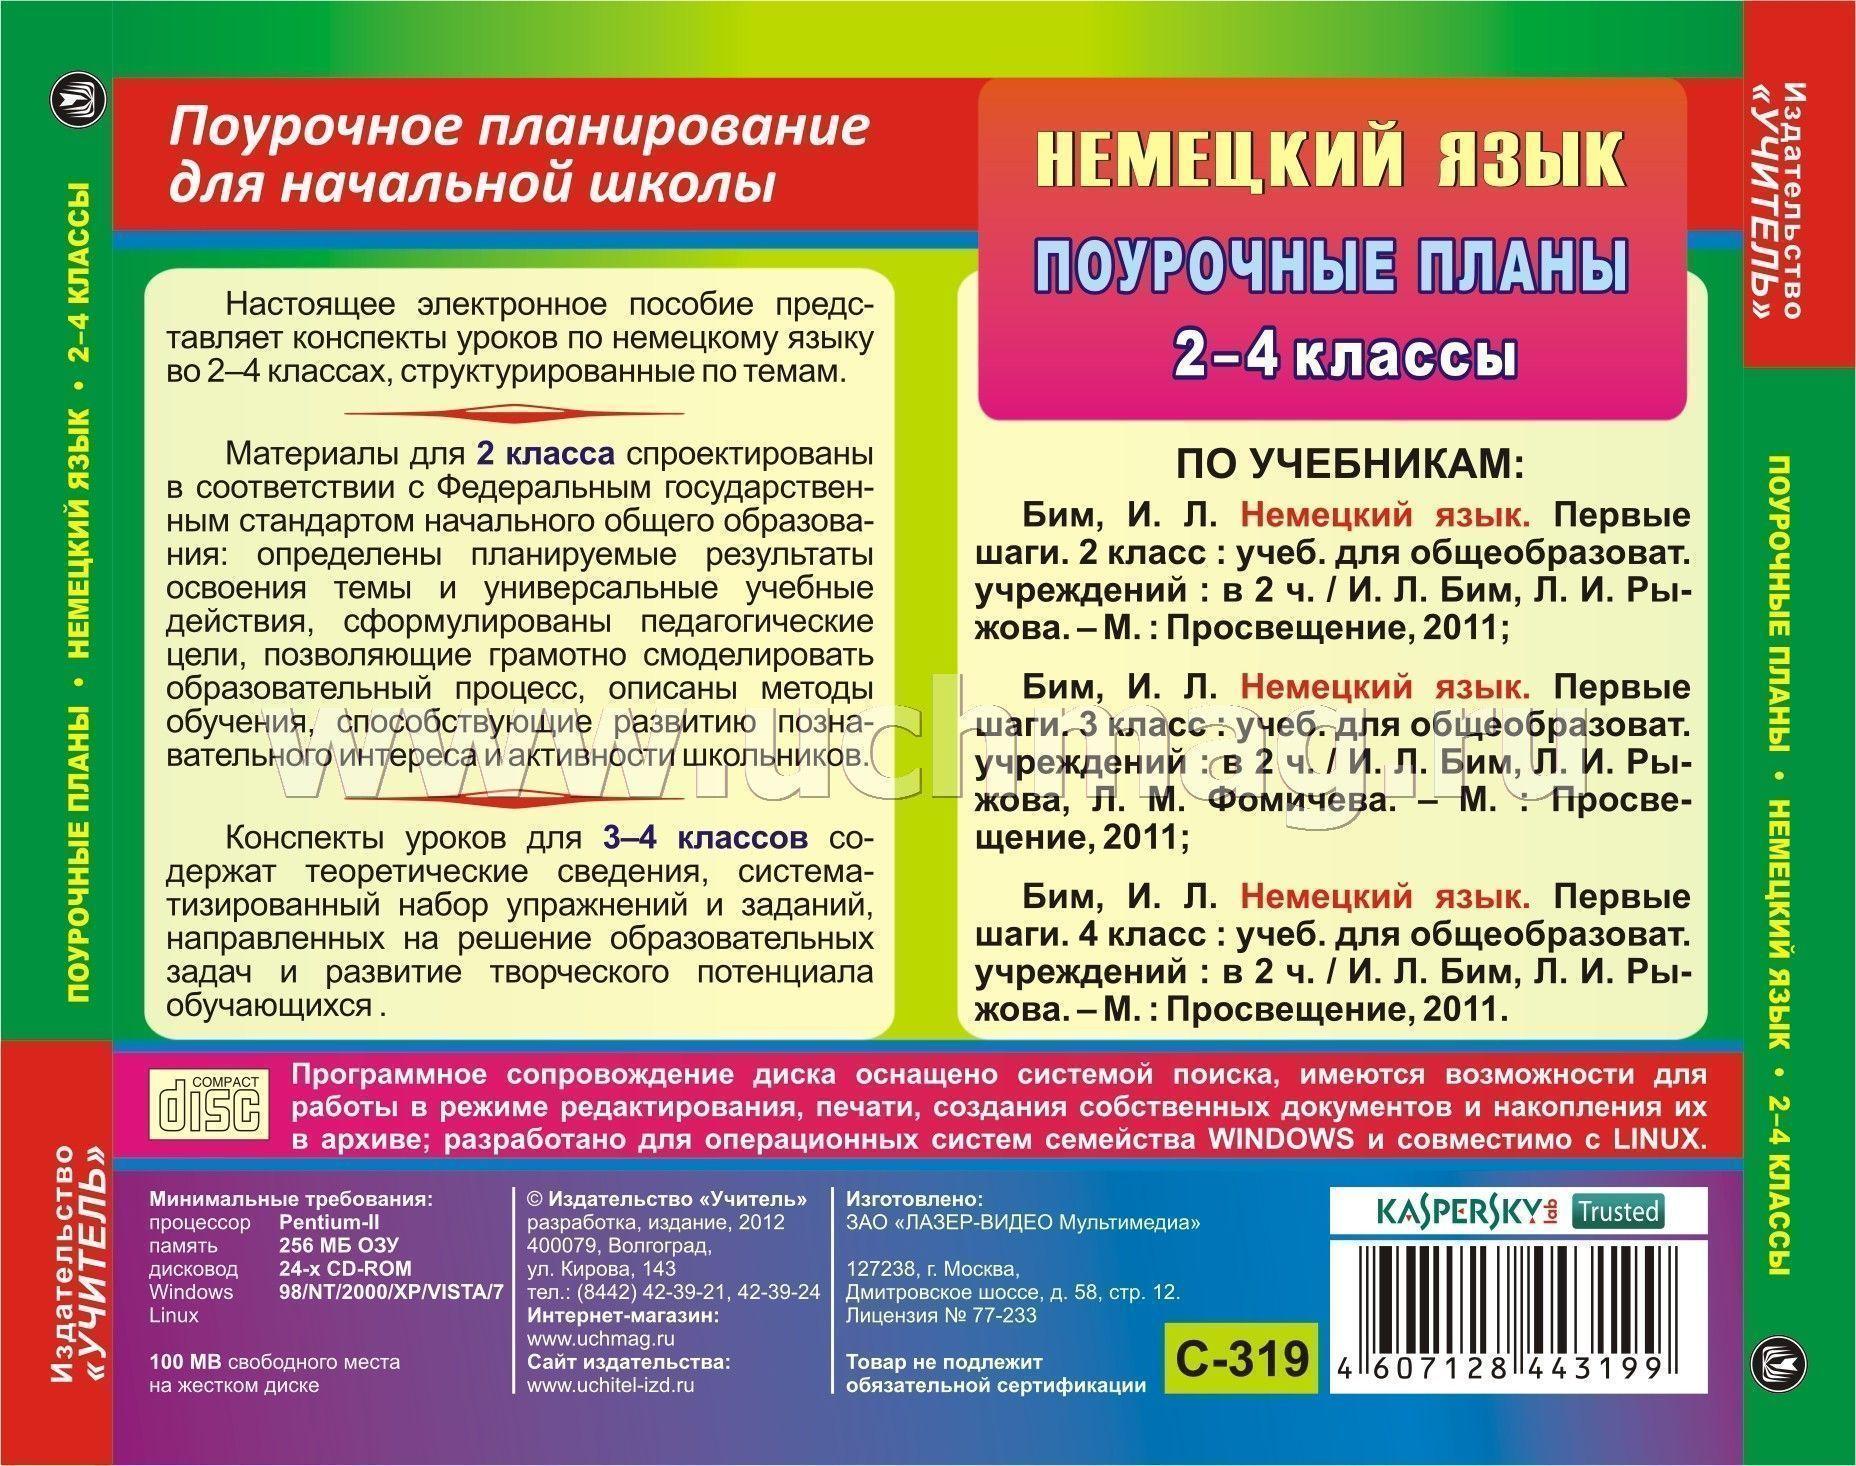 Программа немецкий язык 5 класс - Книги ...: www.ch2mhillblogs.com/blick/page/programma-nemetskiy-yazik-5-klass...